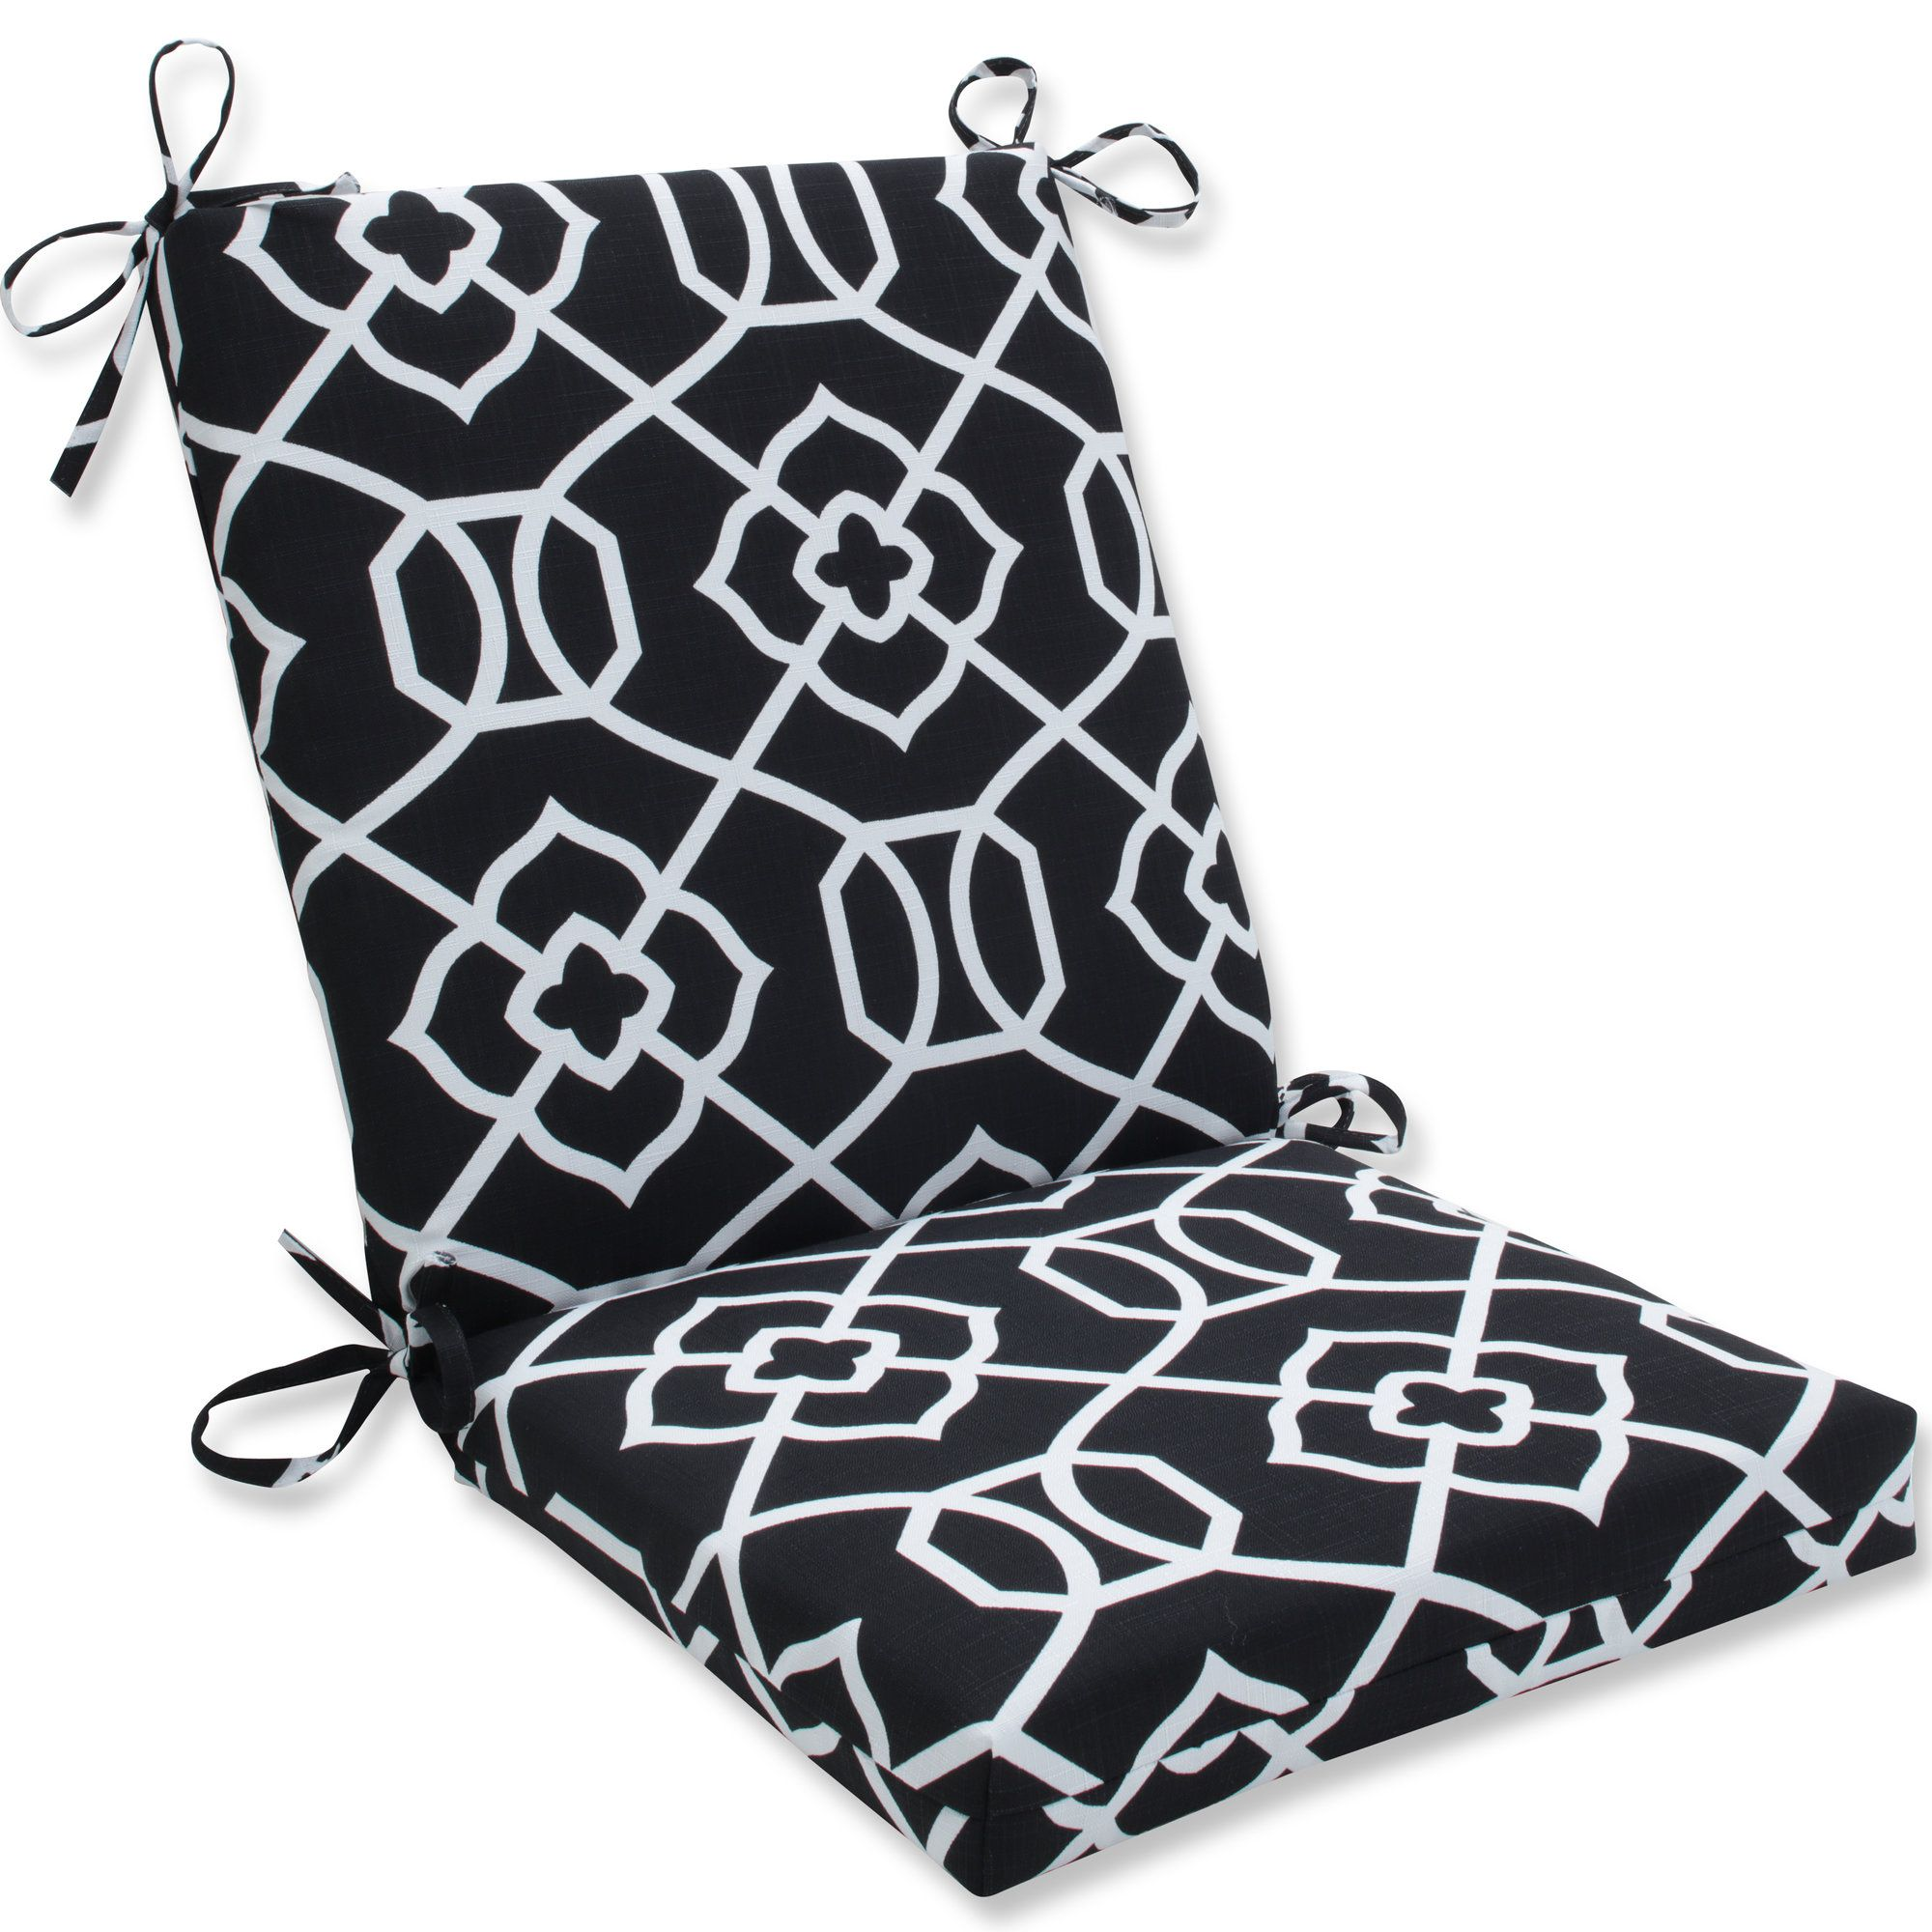 Kirkland Outdoor Dining Chair Cushion Outdoor chair